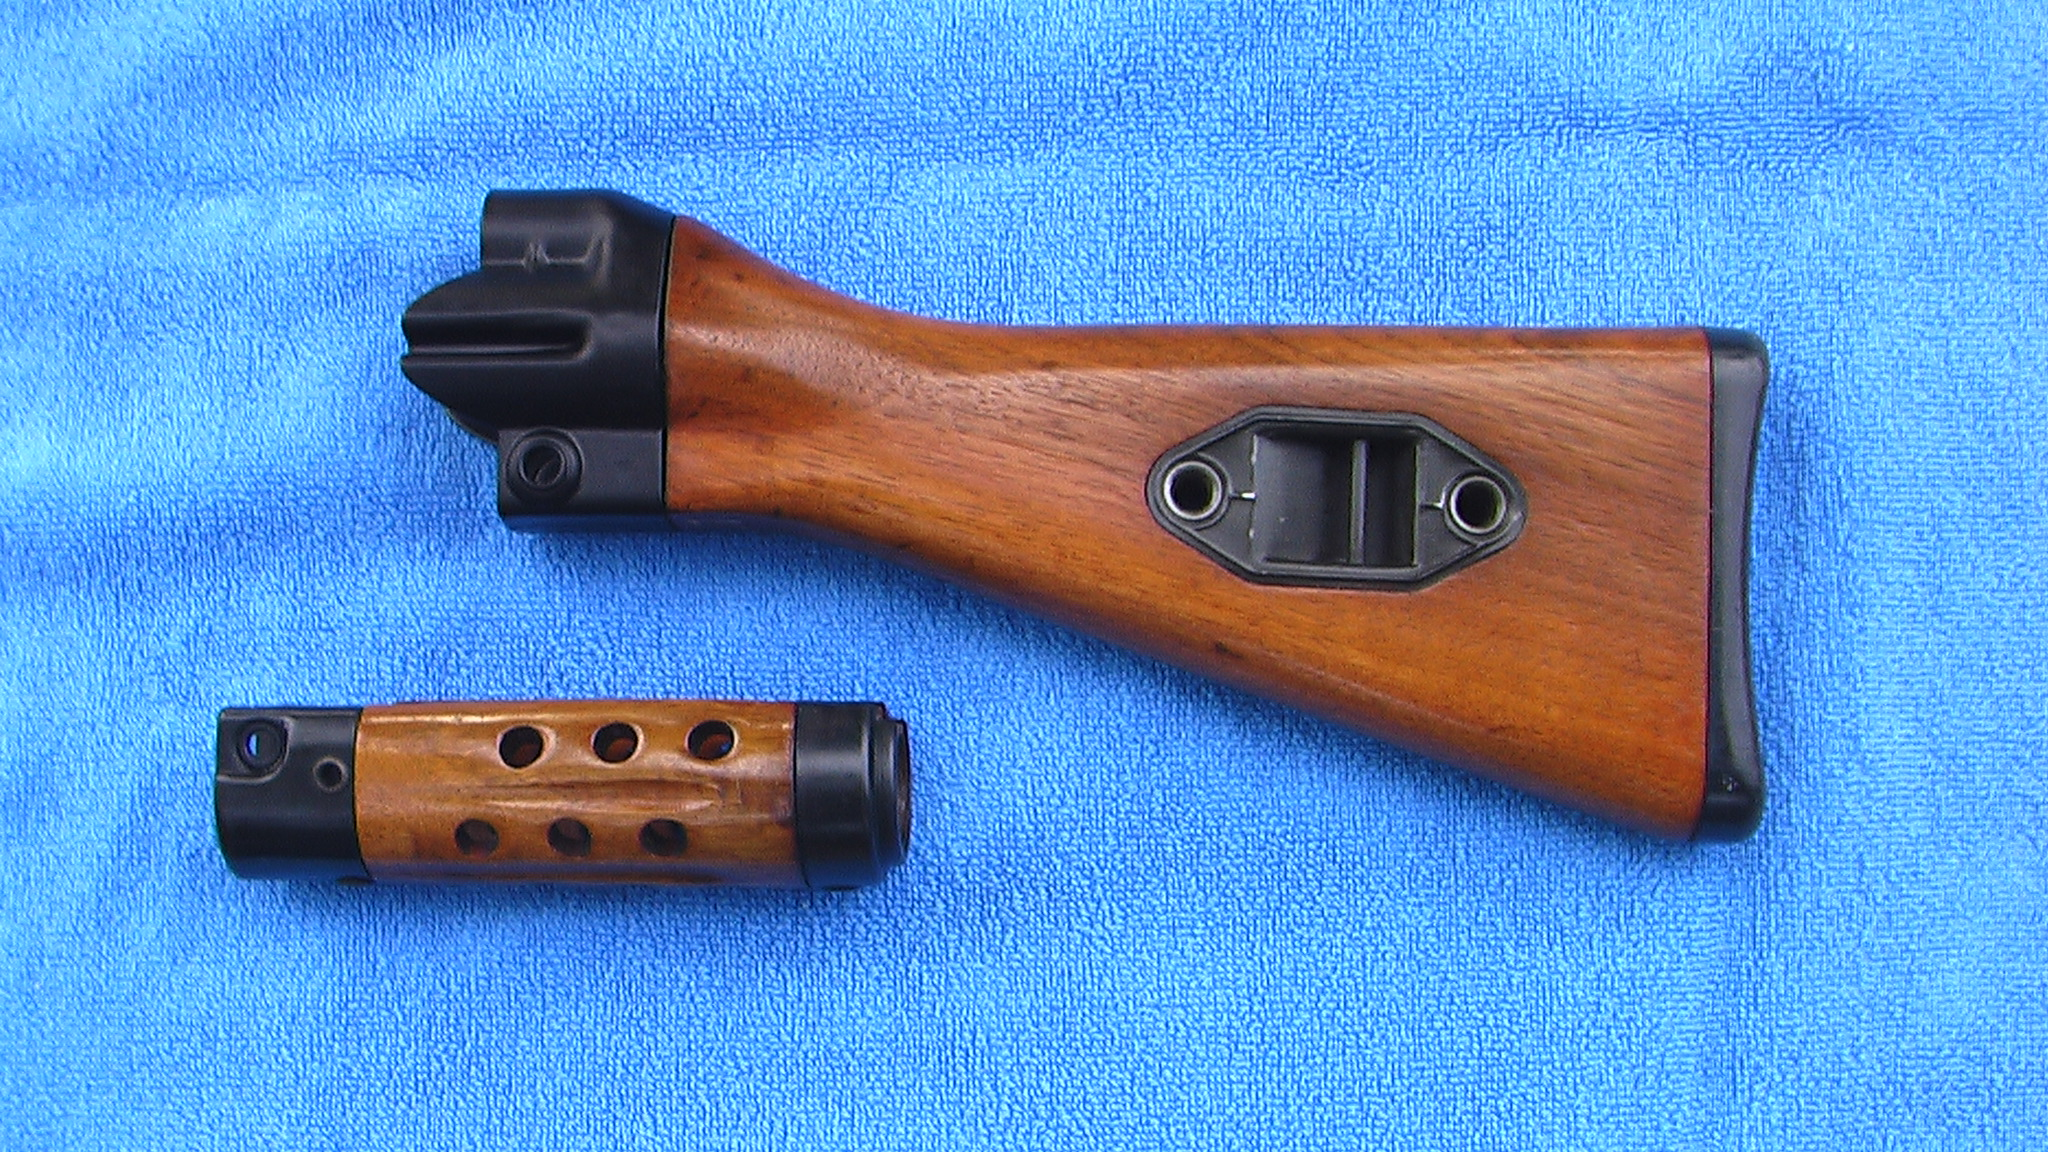 wts hk94 mp5 custom wood stock forearm set sold